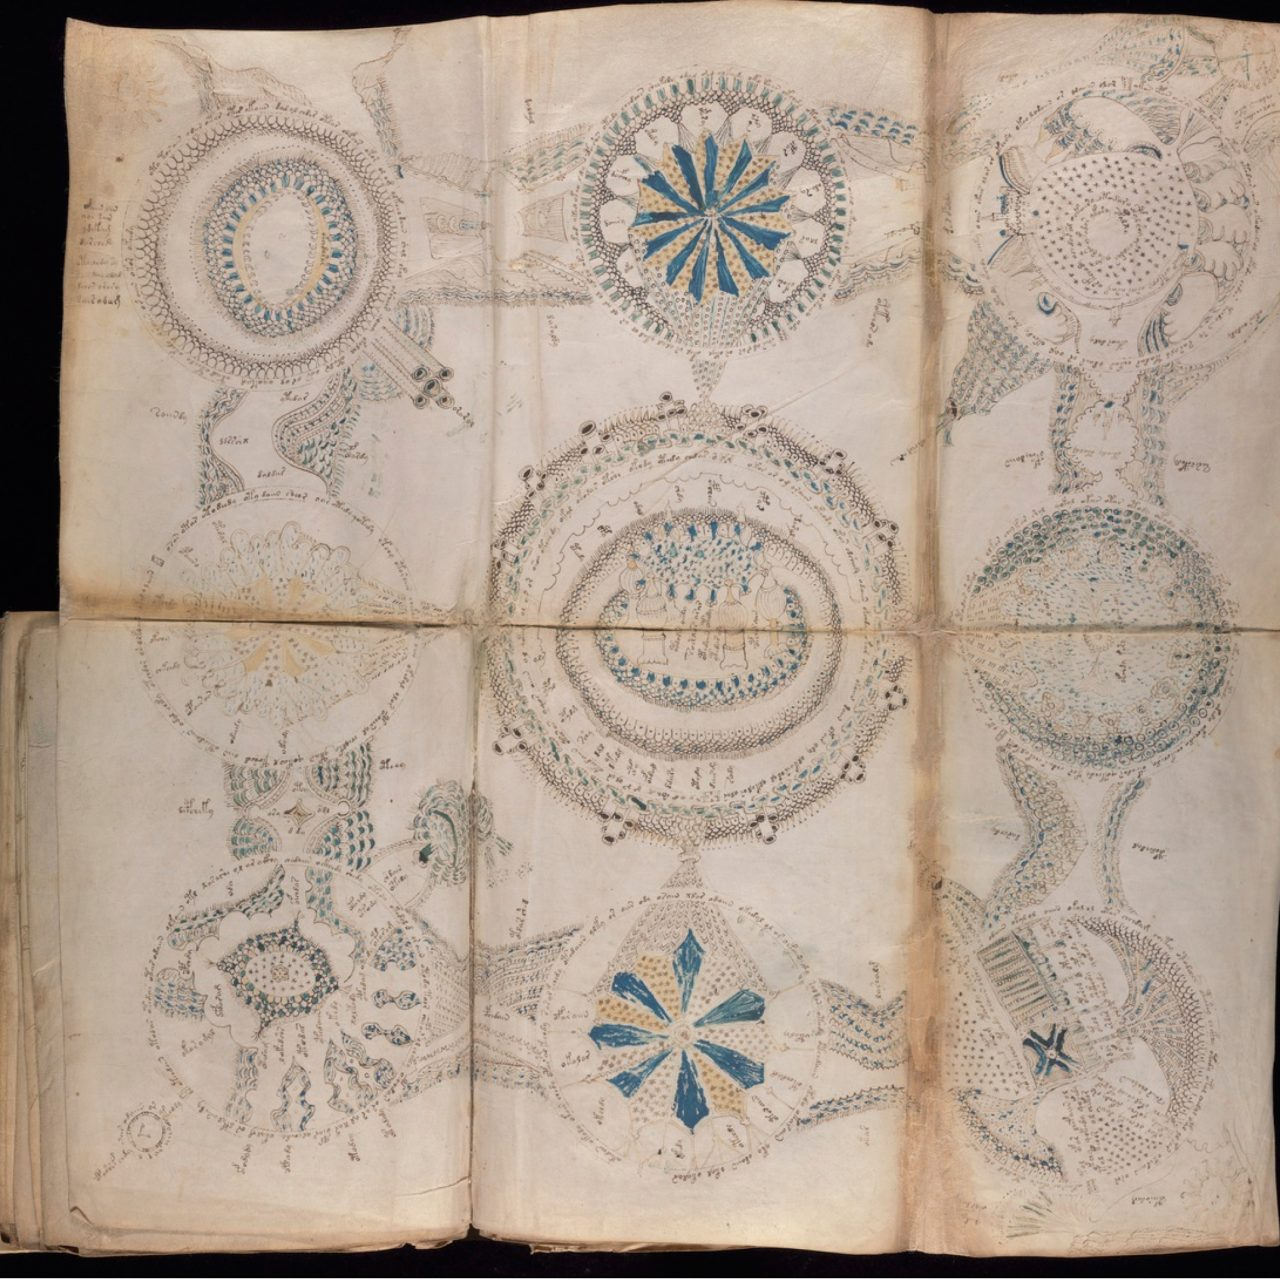 Mysterious Voynich Manuscript Decoded by British Academic